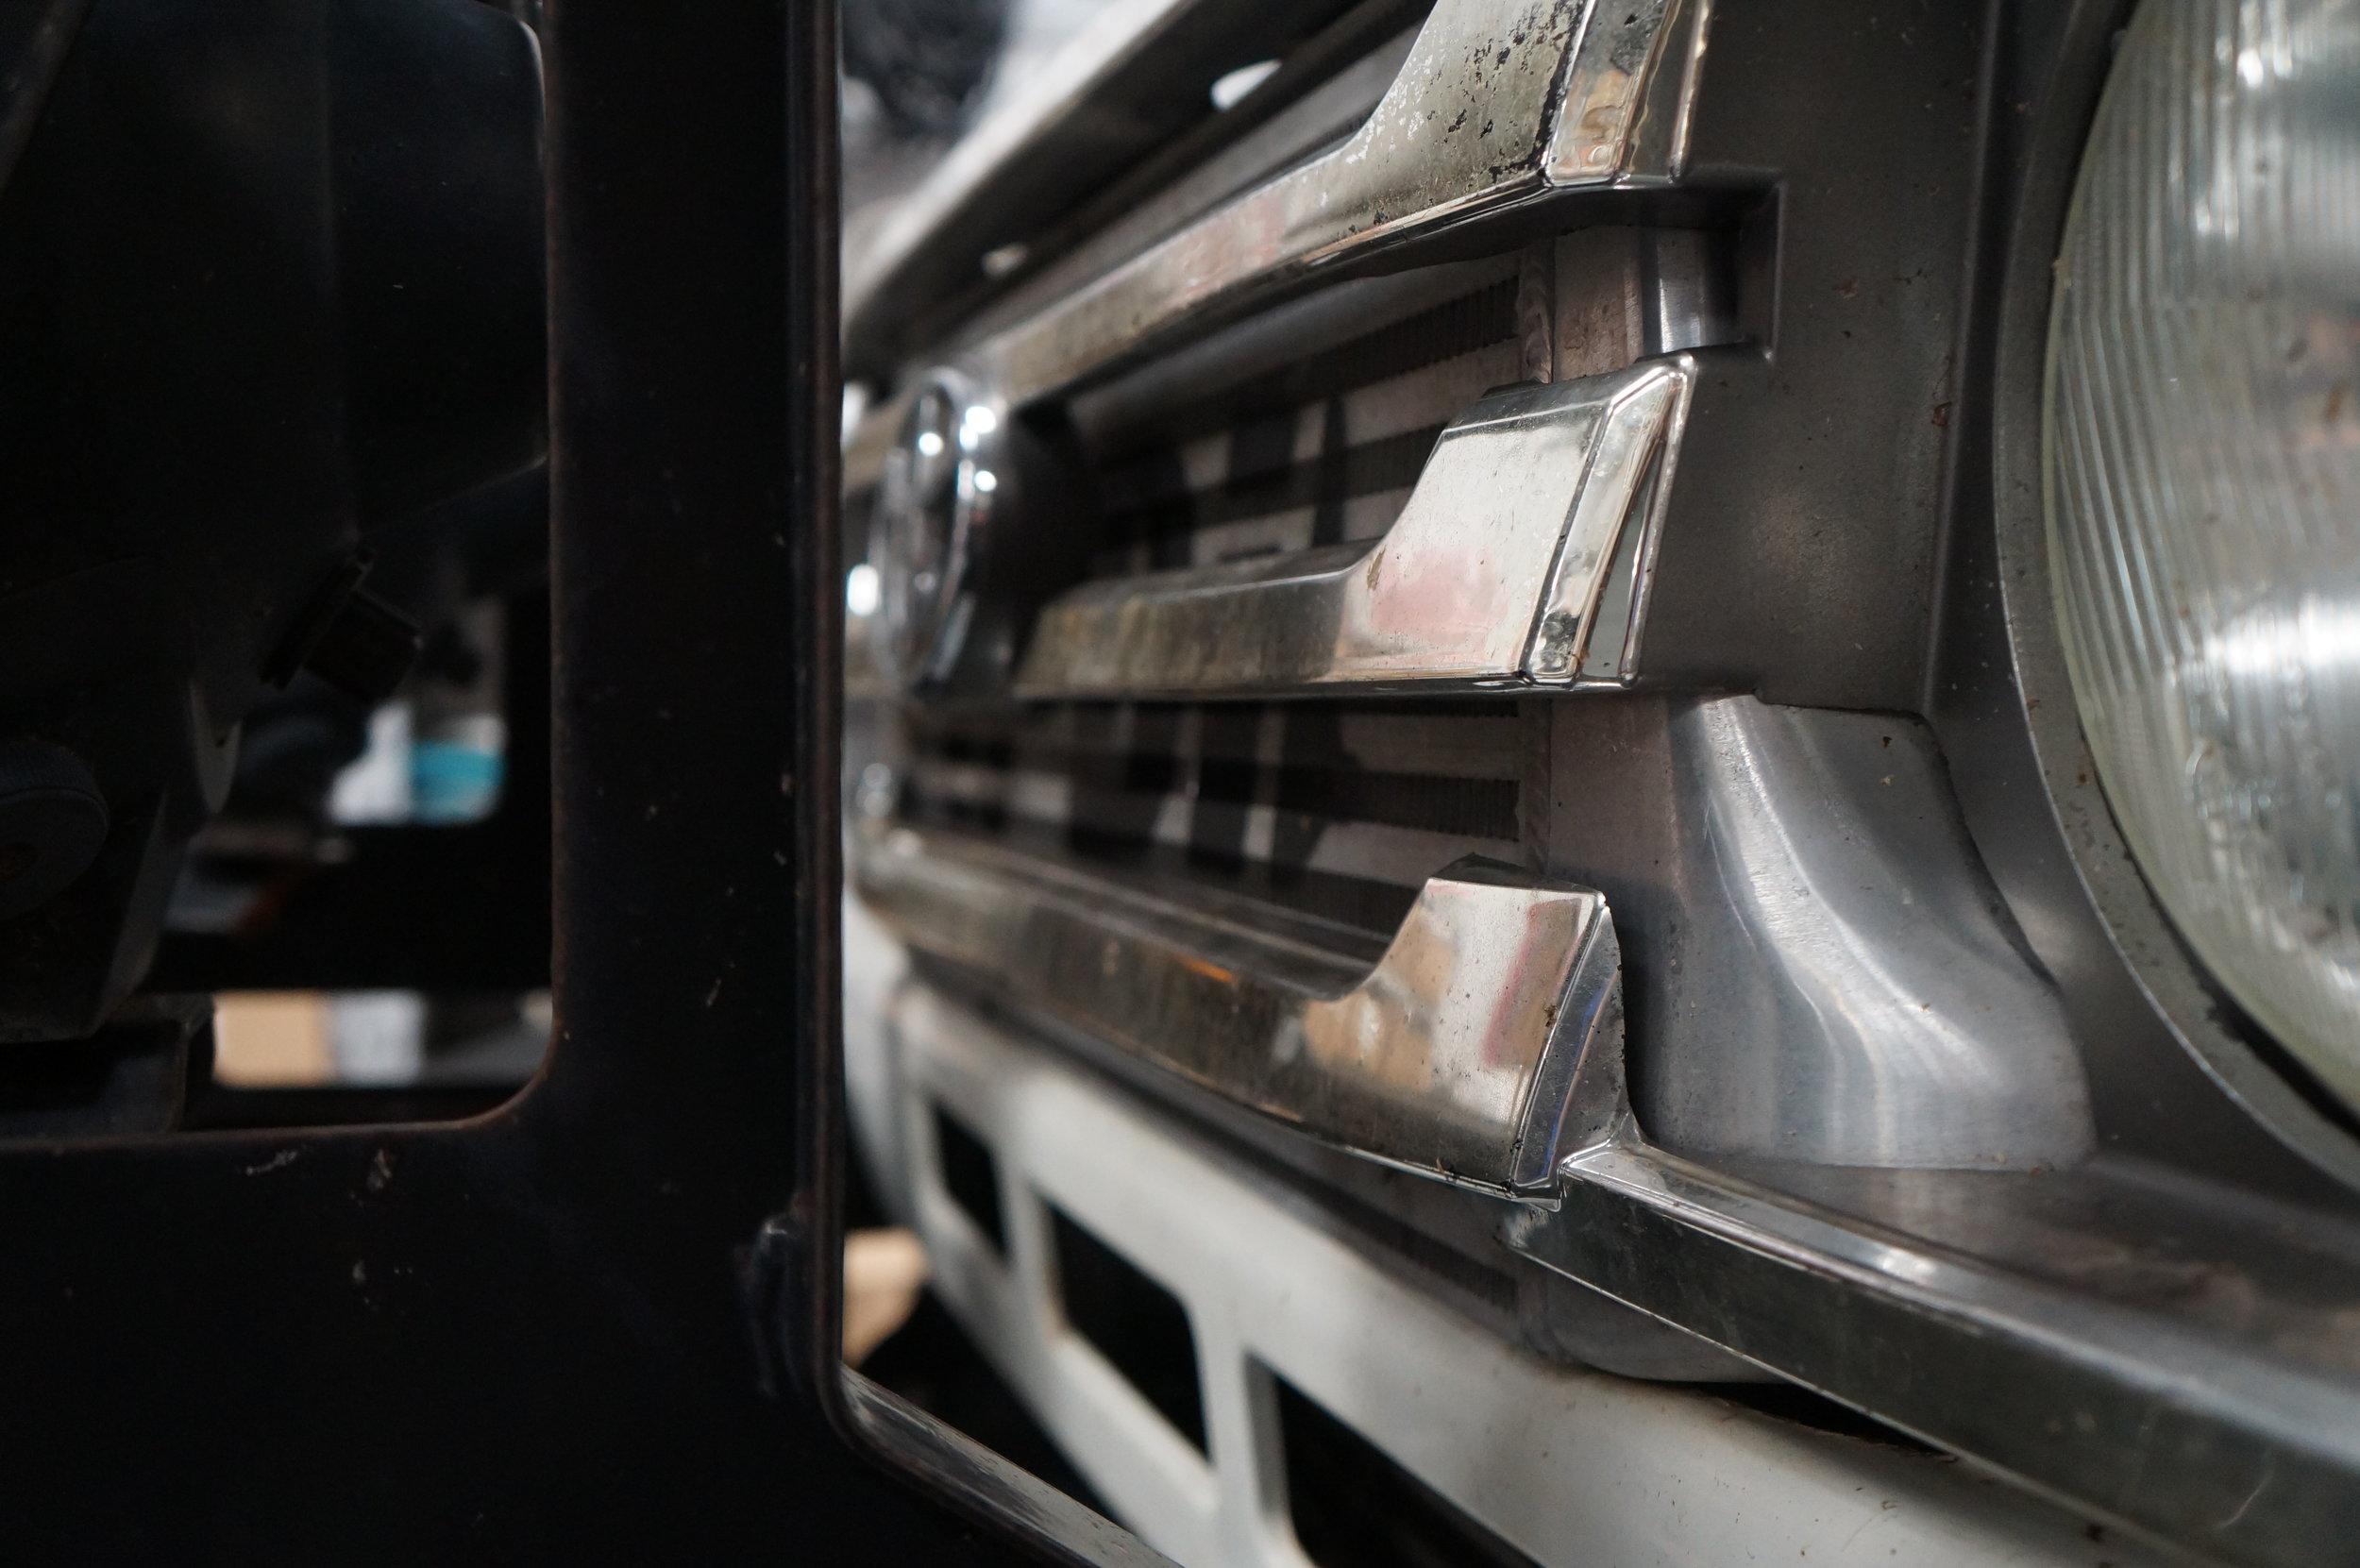 Landcruiser HDJ79 Front Mount intercooler Kit HDJ78 / HDJ79 / HZJ75 / HZJ79  — Performance Diesel Intercoolers